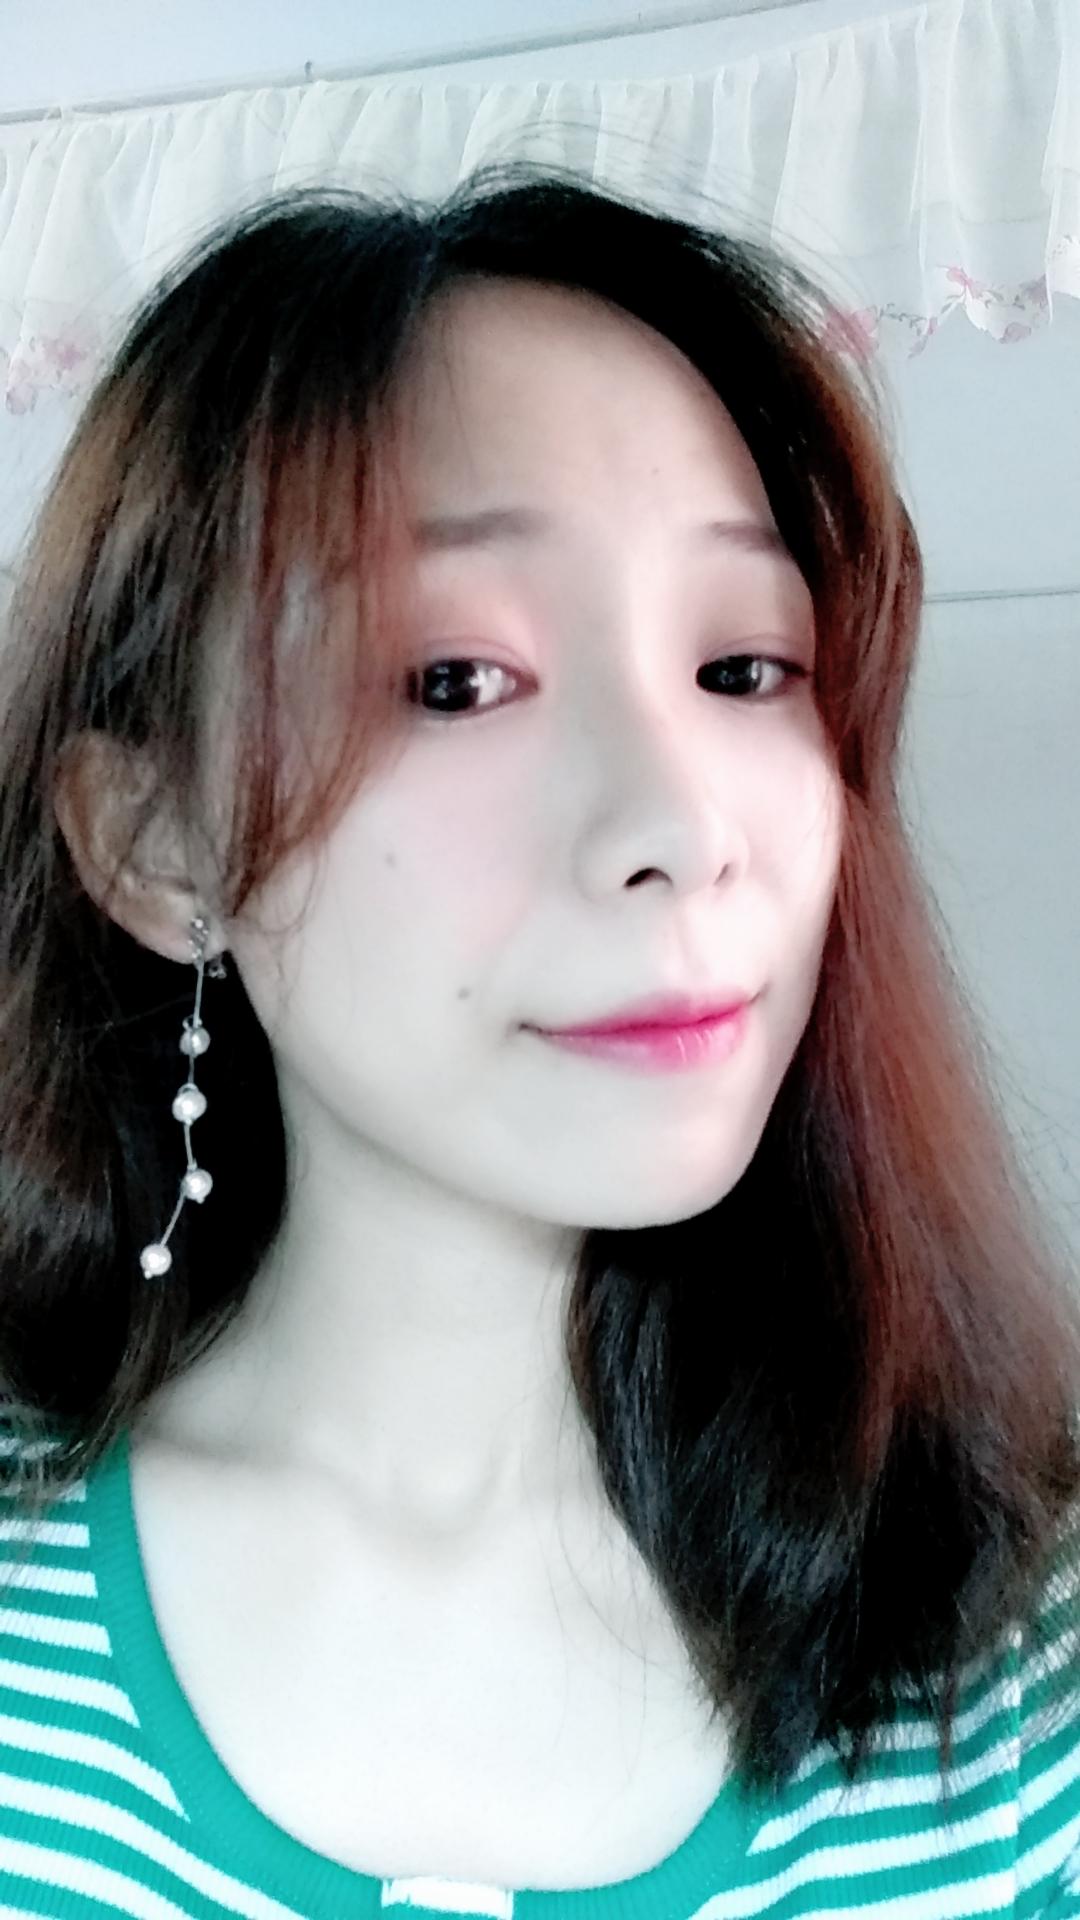 MYXJ_20180923163136_fast.jpg